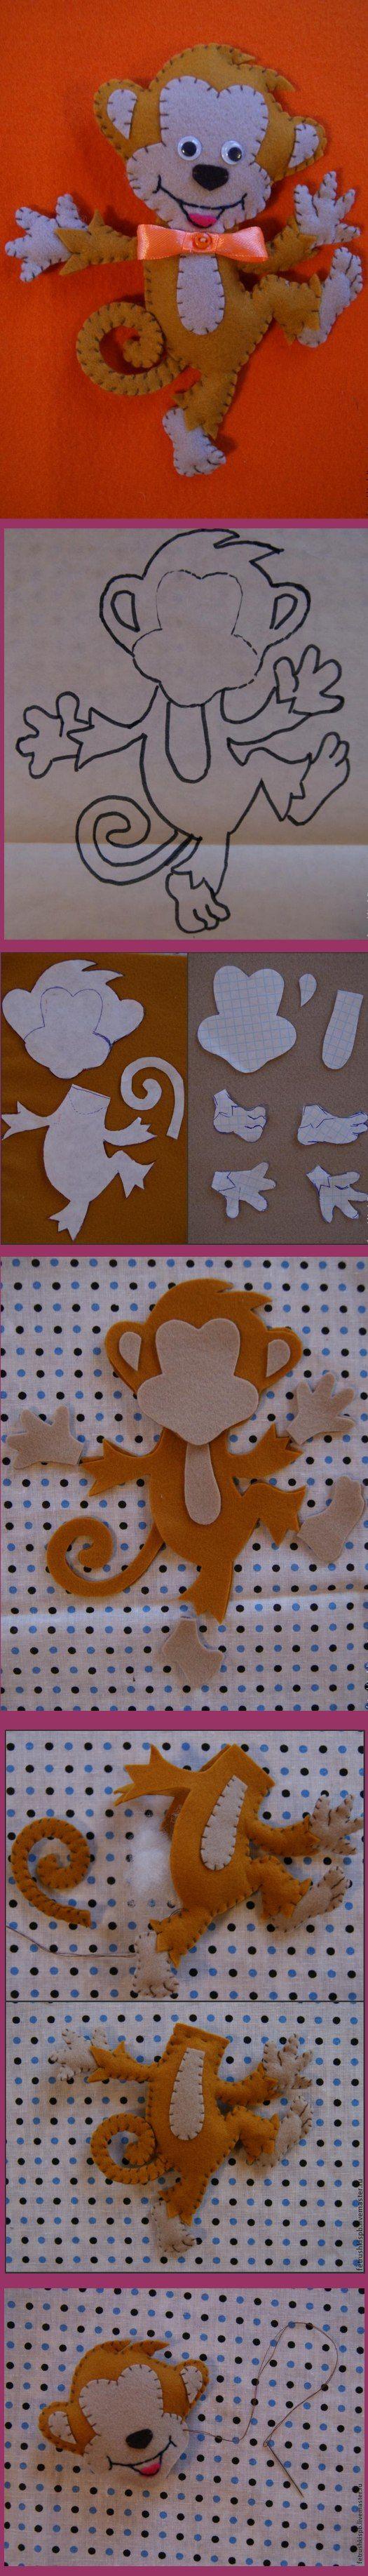 felt monkey stuffed toy pattern idea handmade craft animal